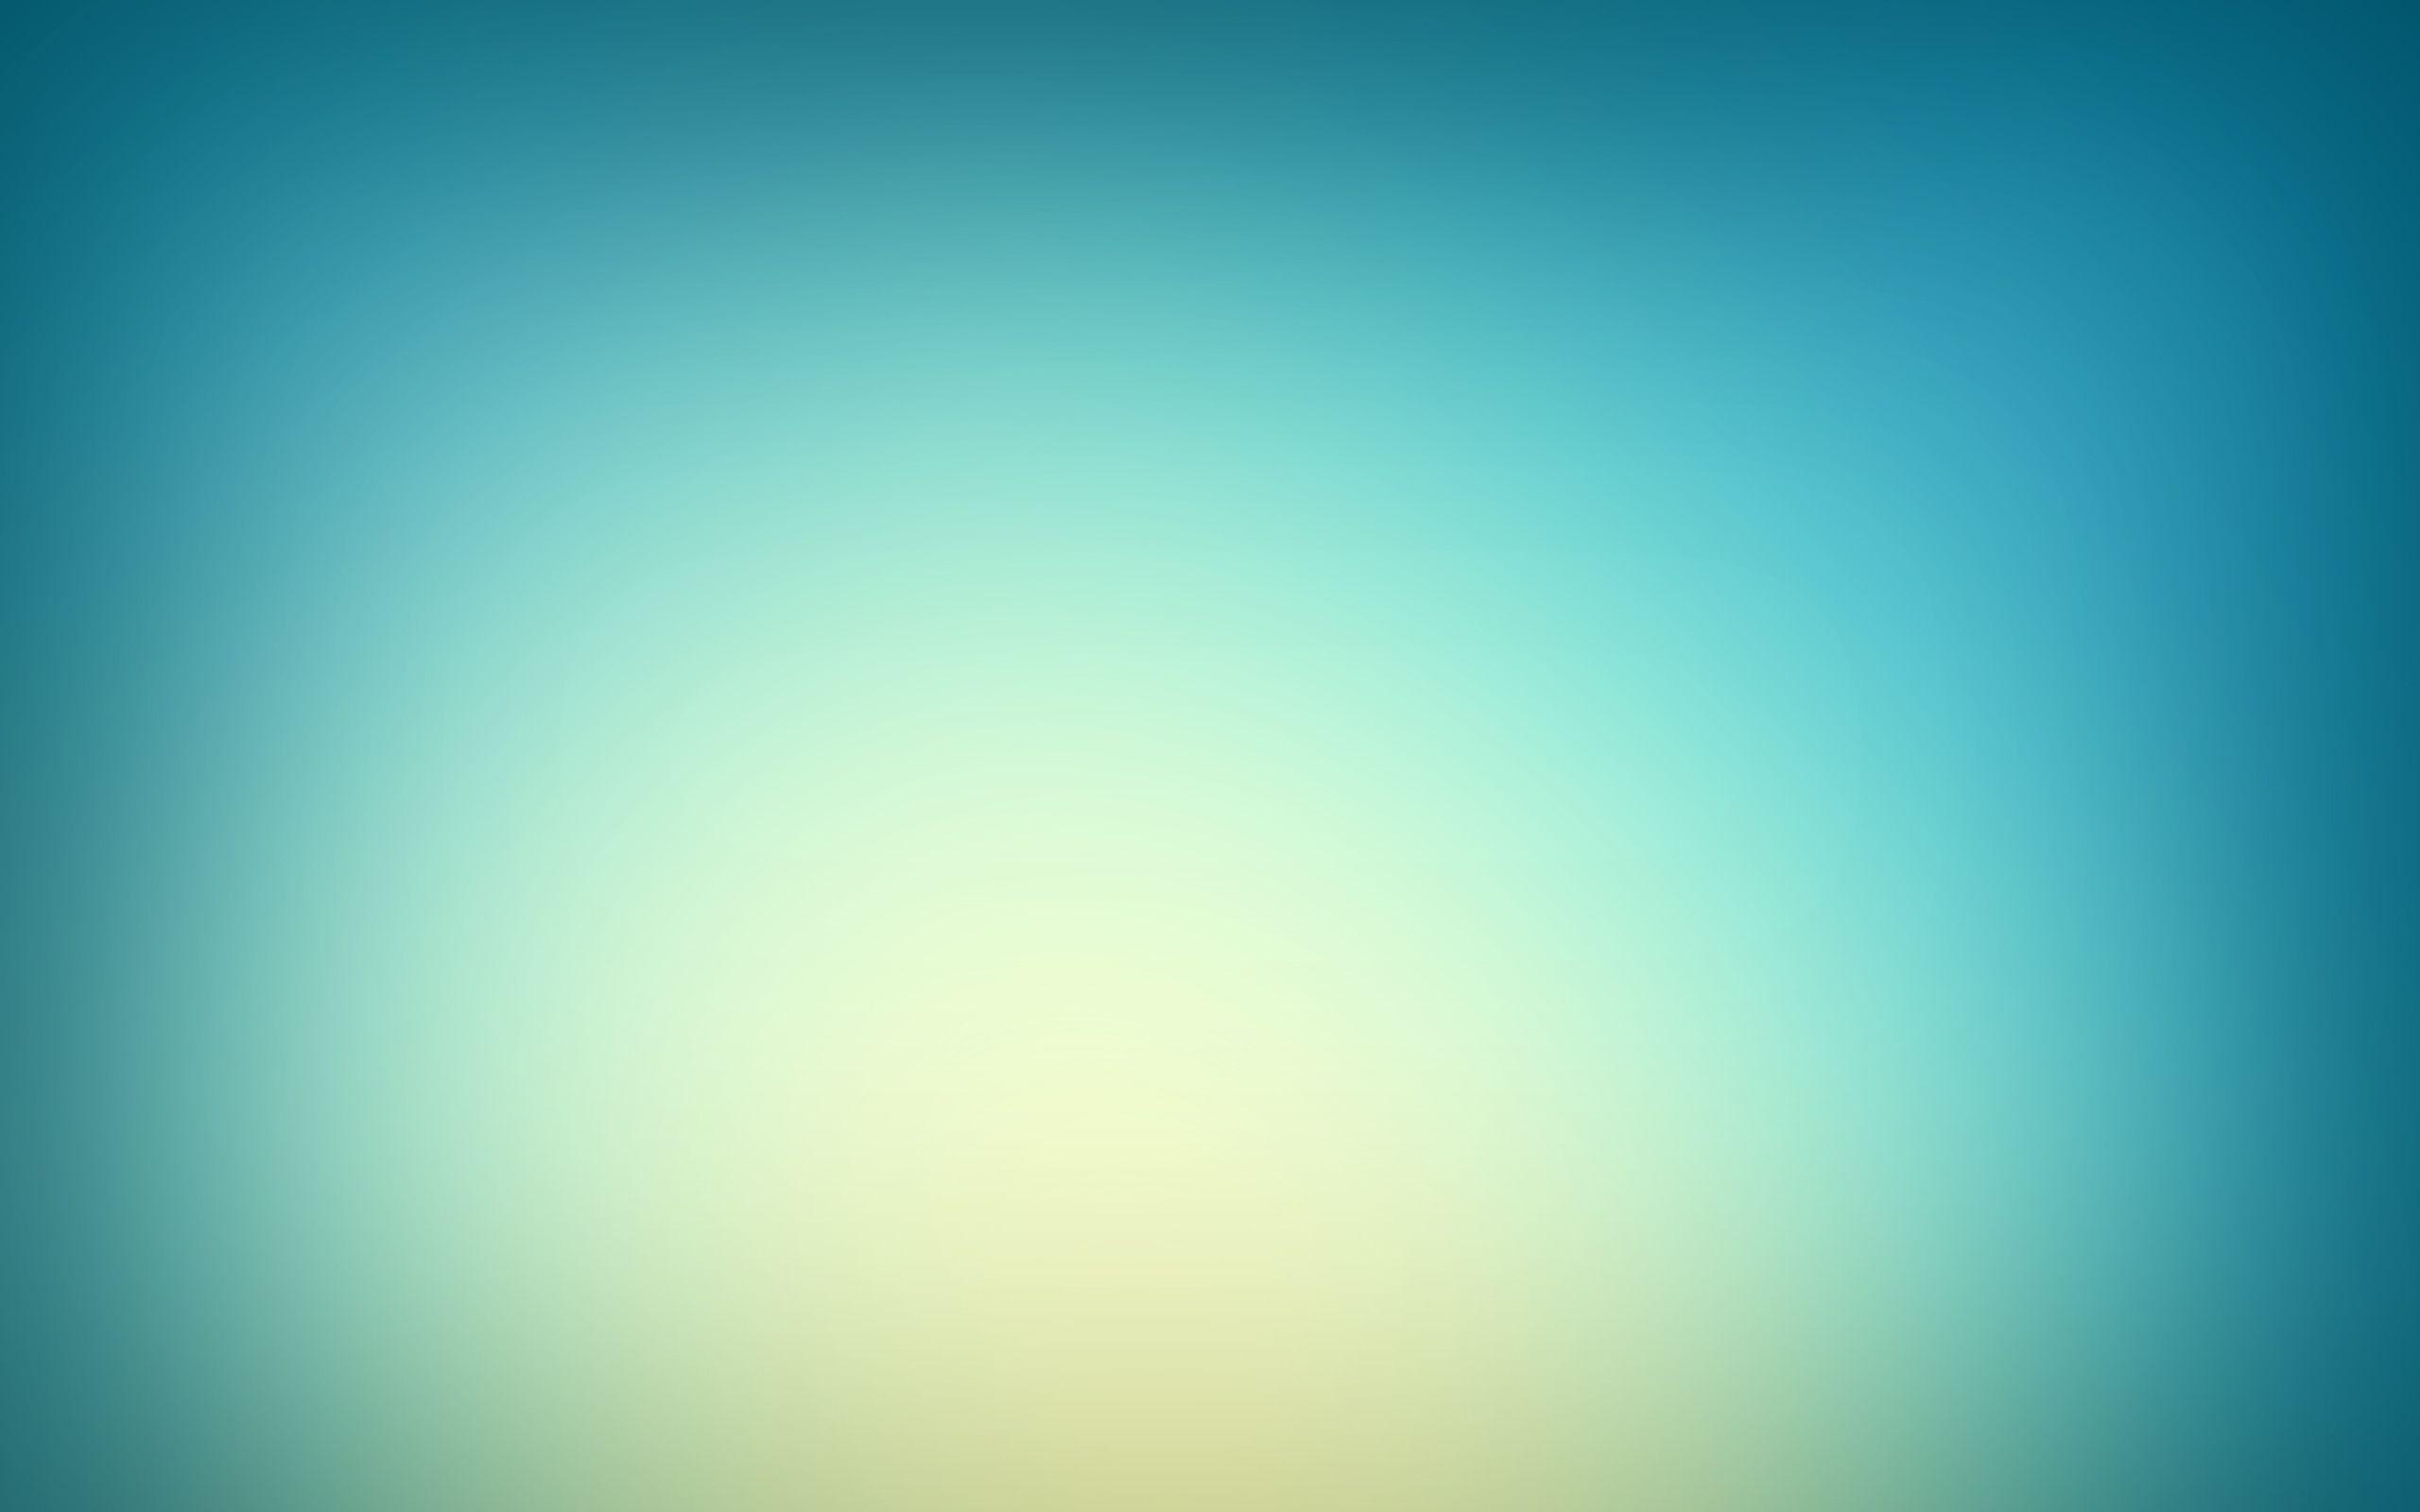 gradient-abstract-hd-wallpaper-2560x1600-9694.jpg